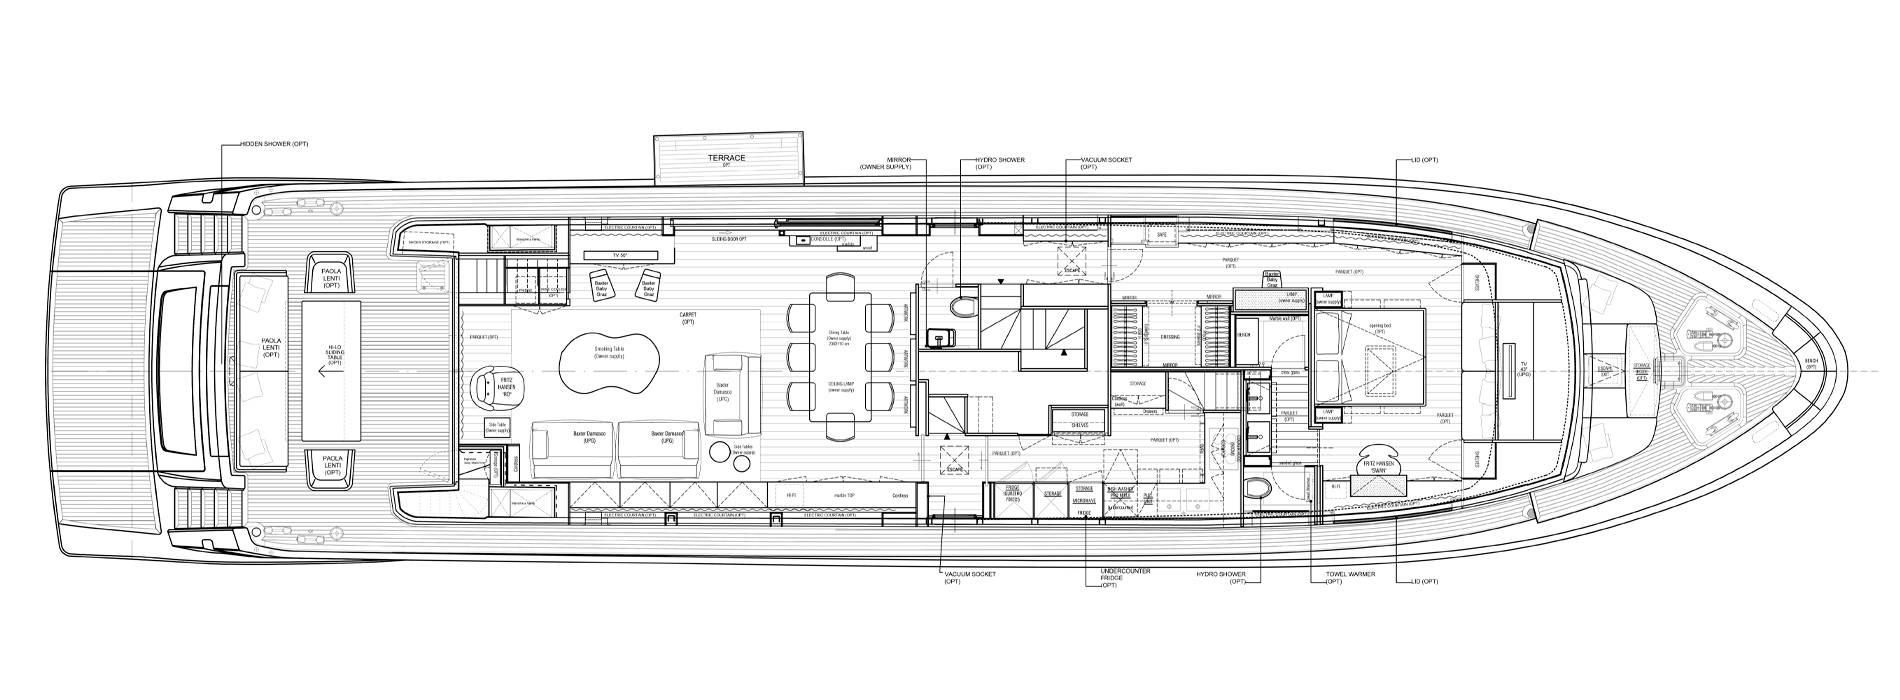 Sanlorenzo Yachts SL106-625 Main deck